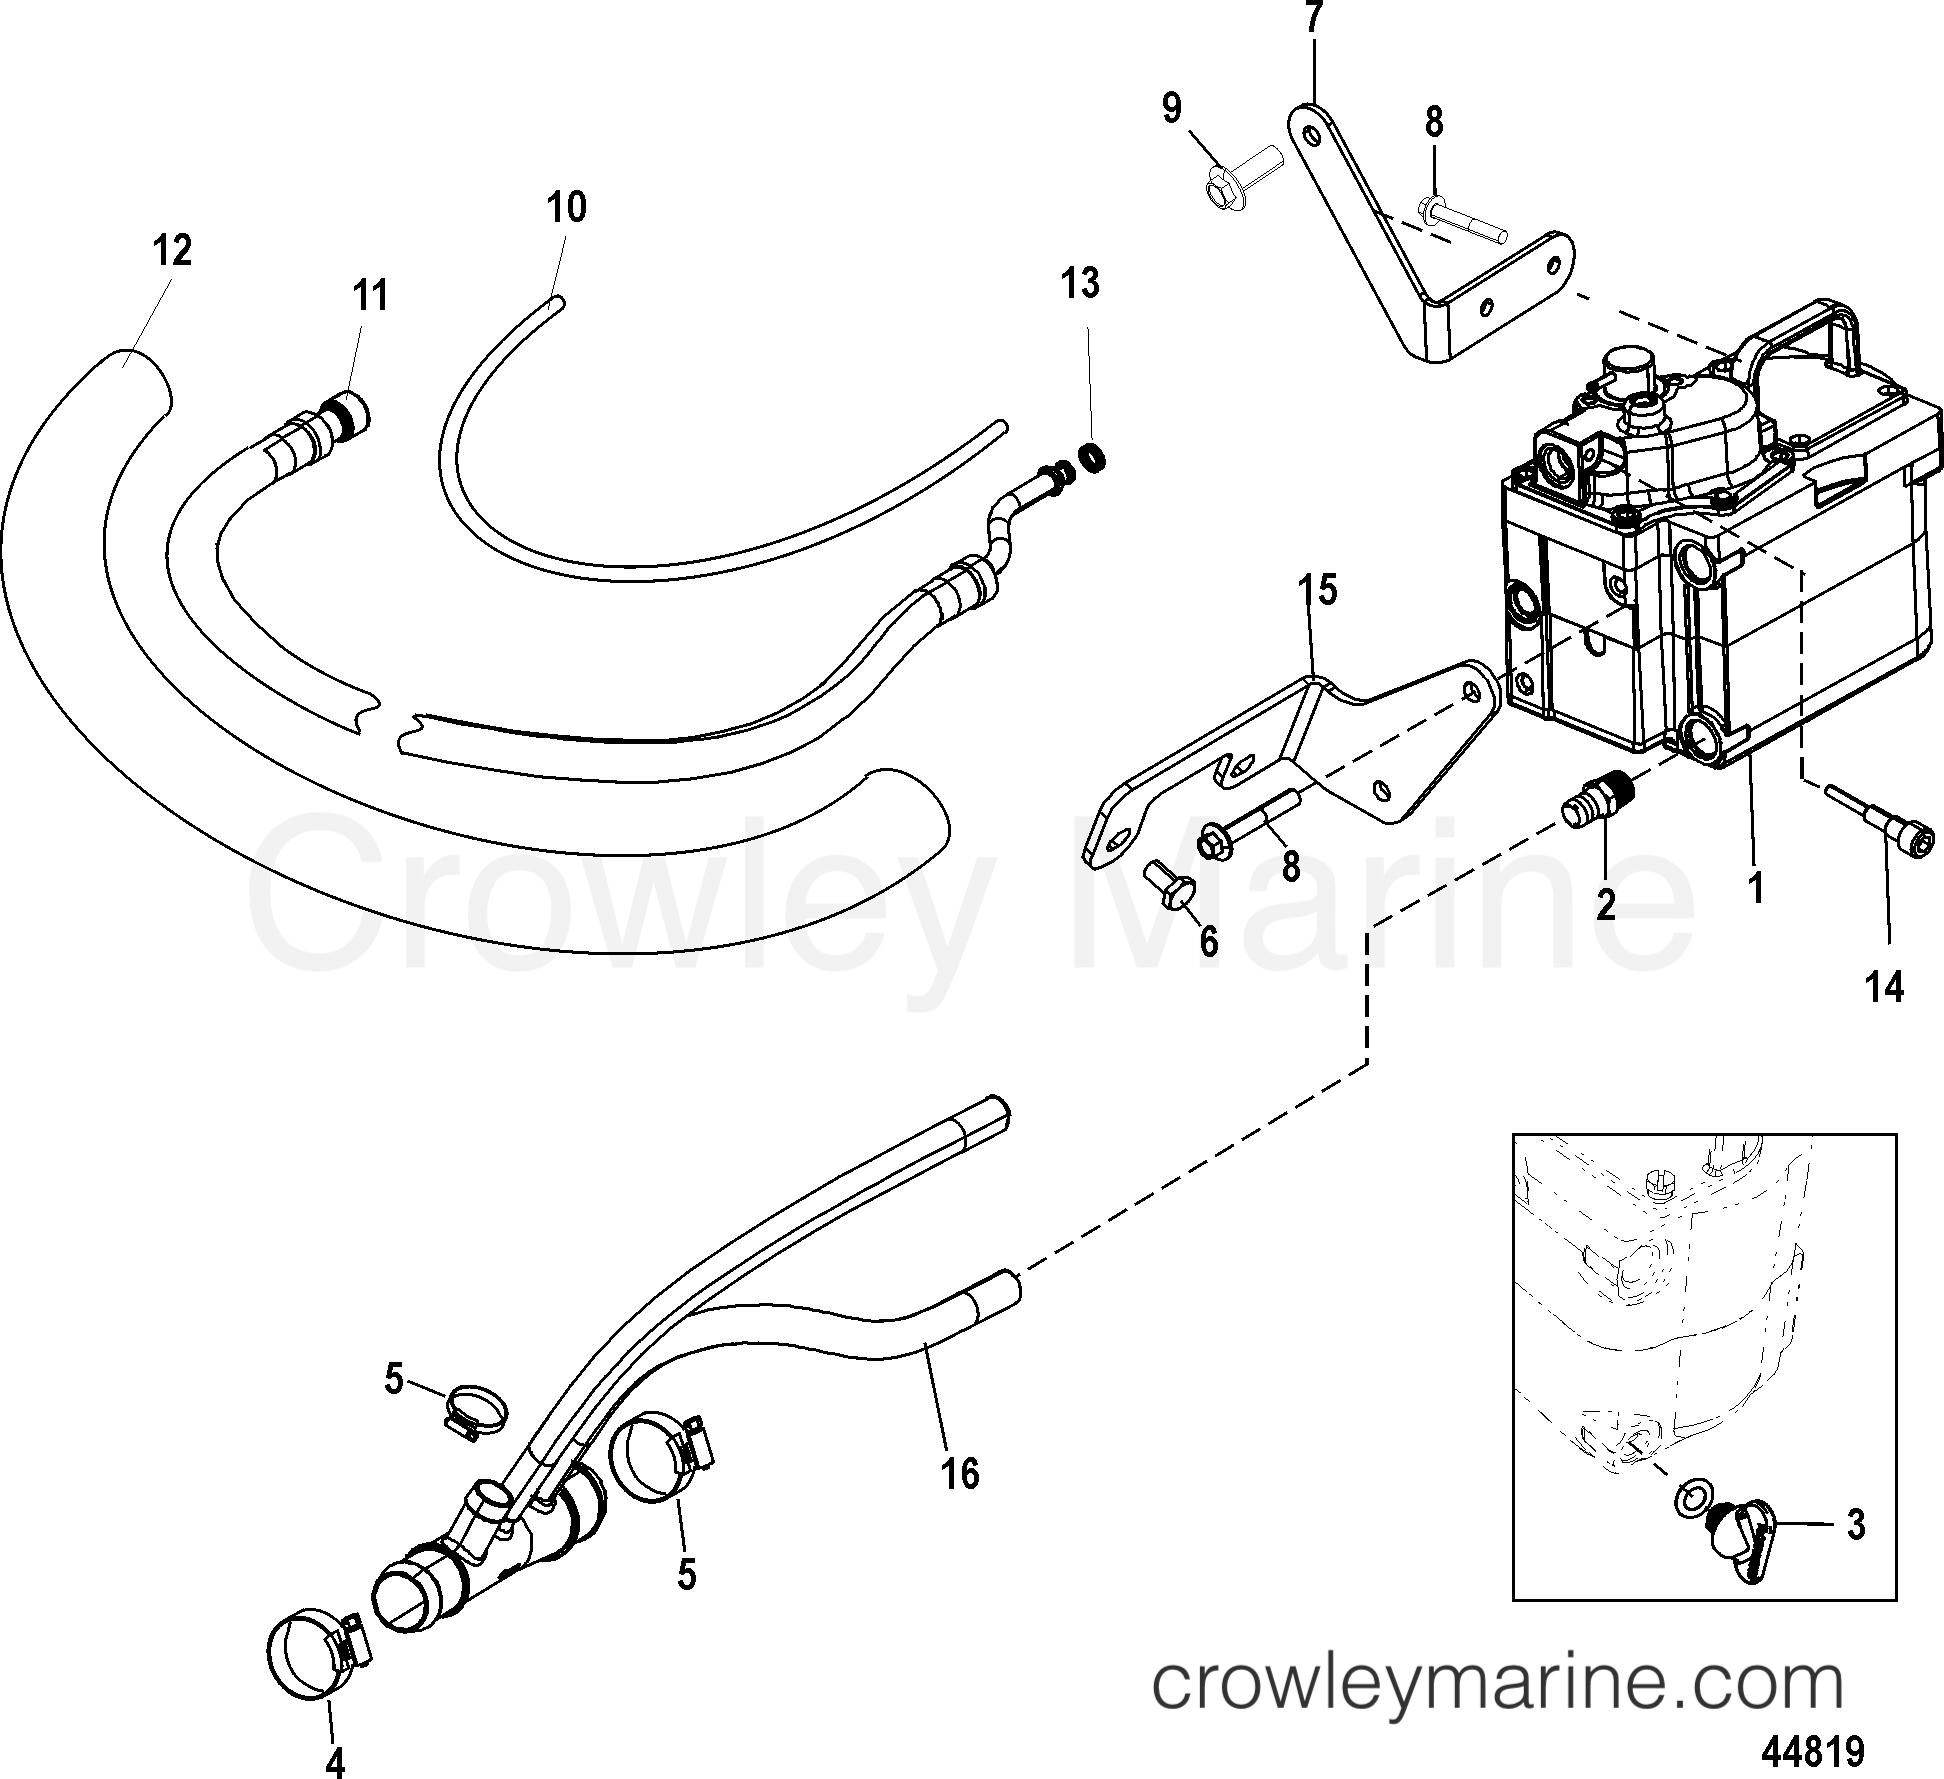 COOL FUEL SYSTEM, BRAVO - 1998 Mercury Inboard Engine 350